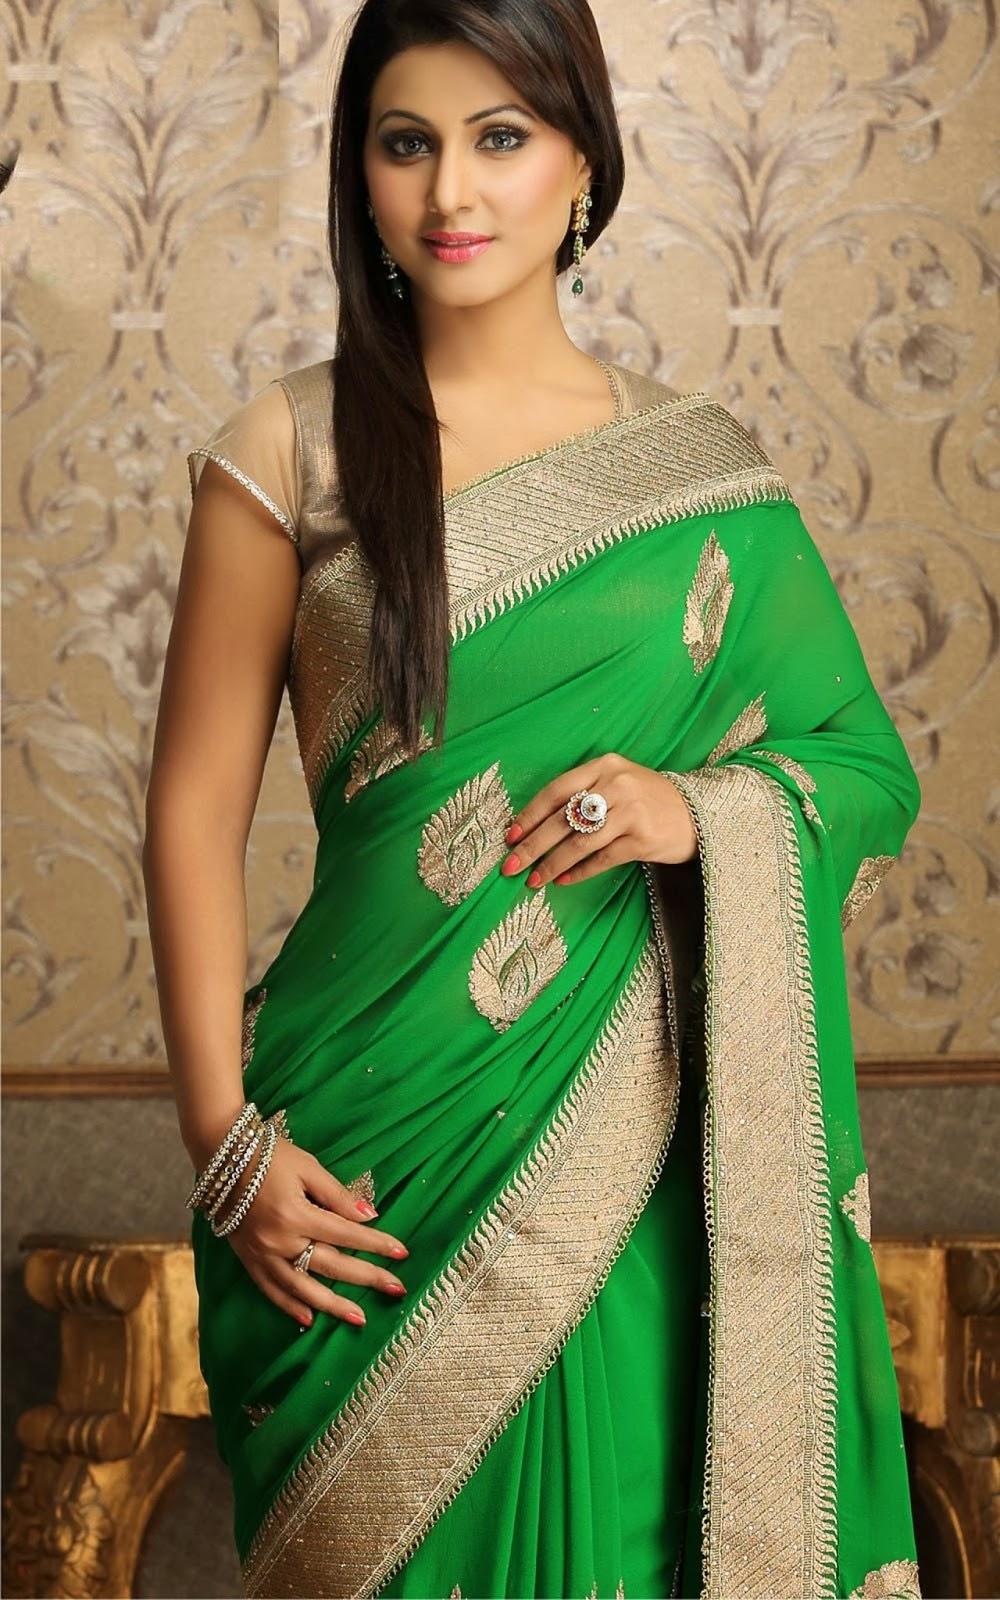 Hina Khan Hd Photos Free And Biography Tv Biography